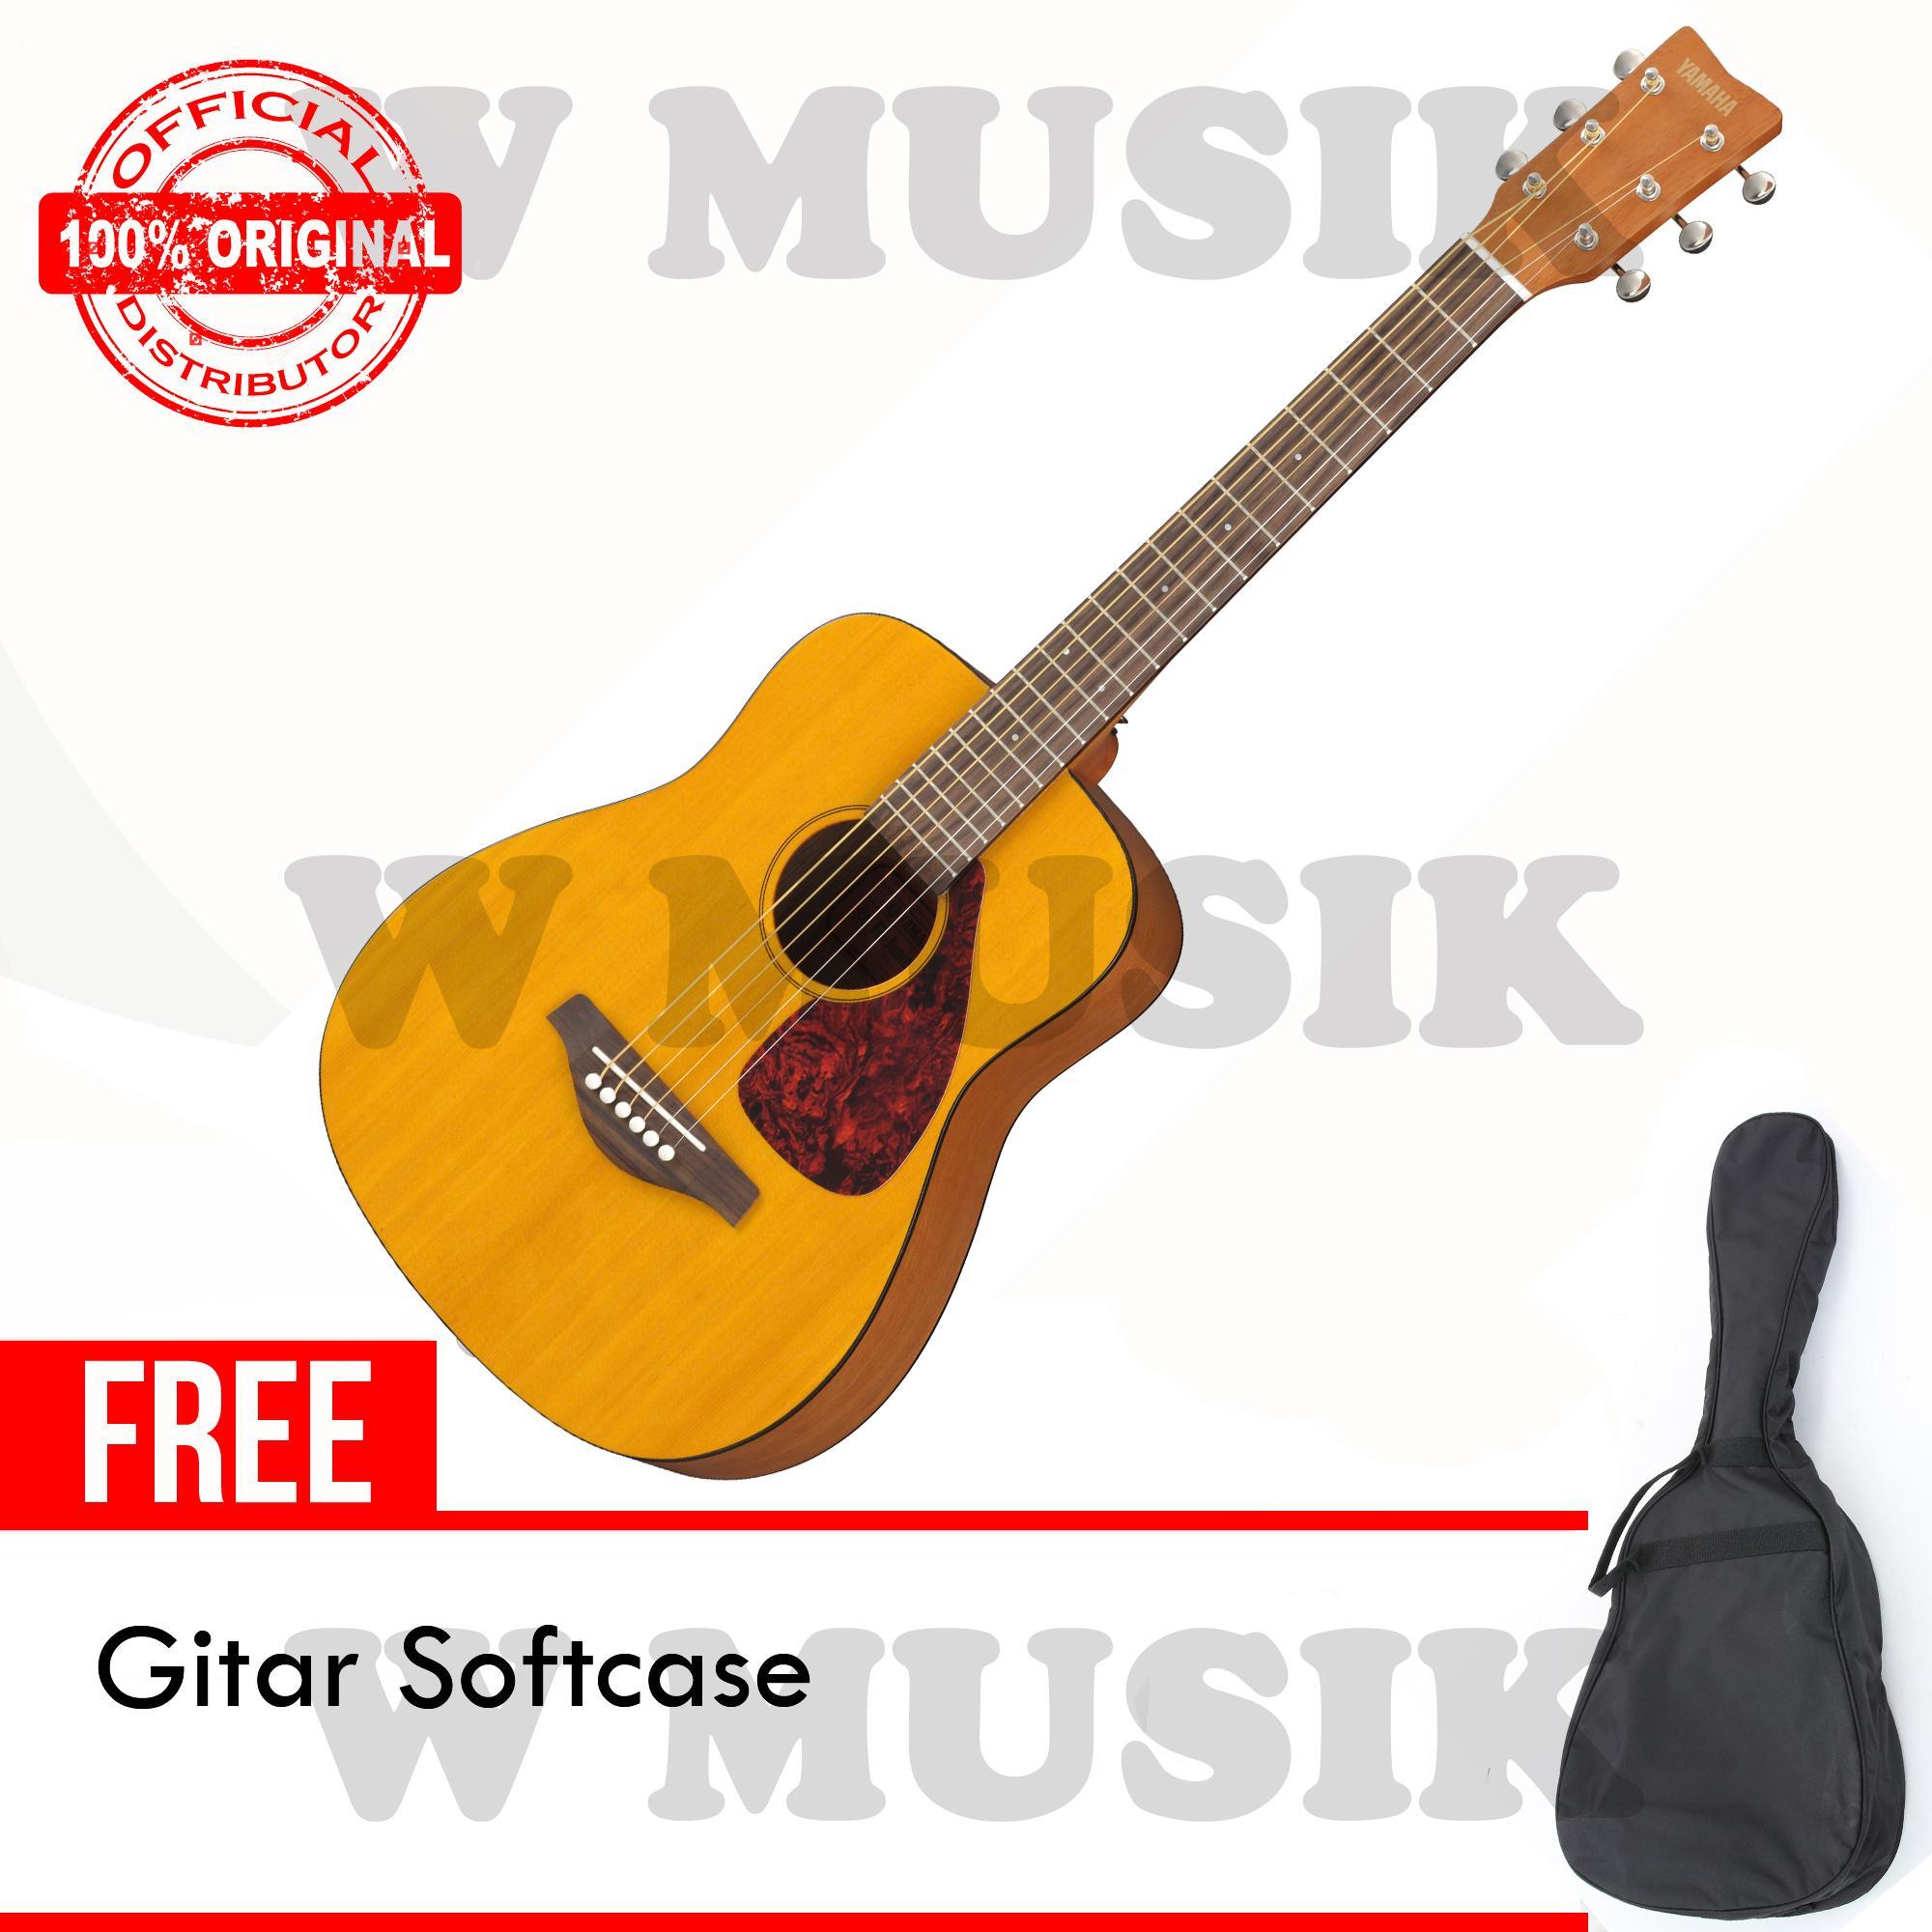 Yamaha Gitar Akustik (3/4) FG Junior JR-1 / JR1 / JR 1 - Natural + Gratis Softcase